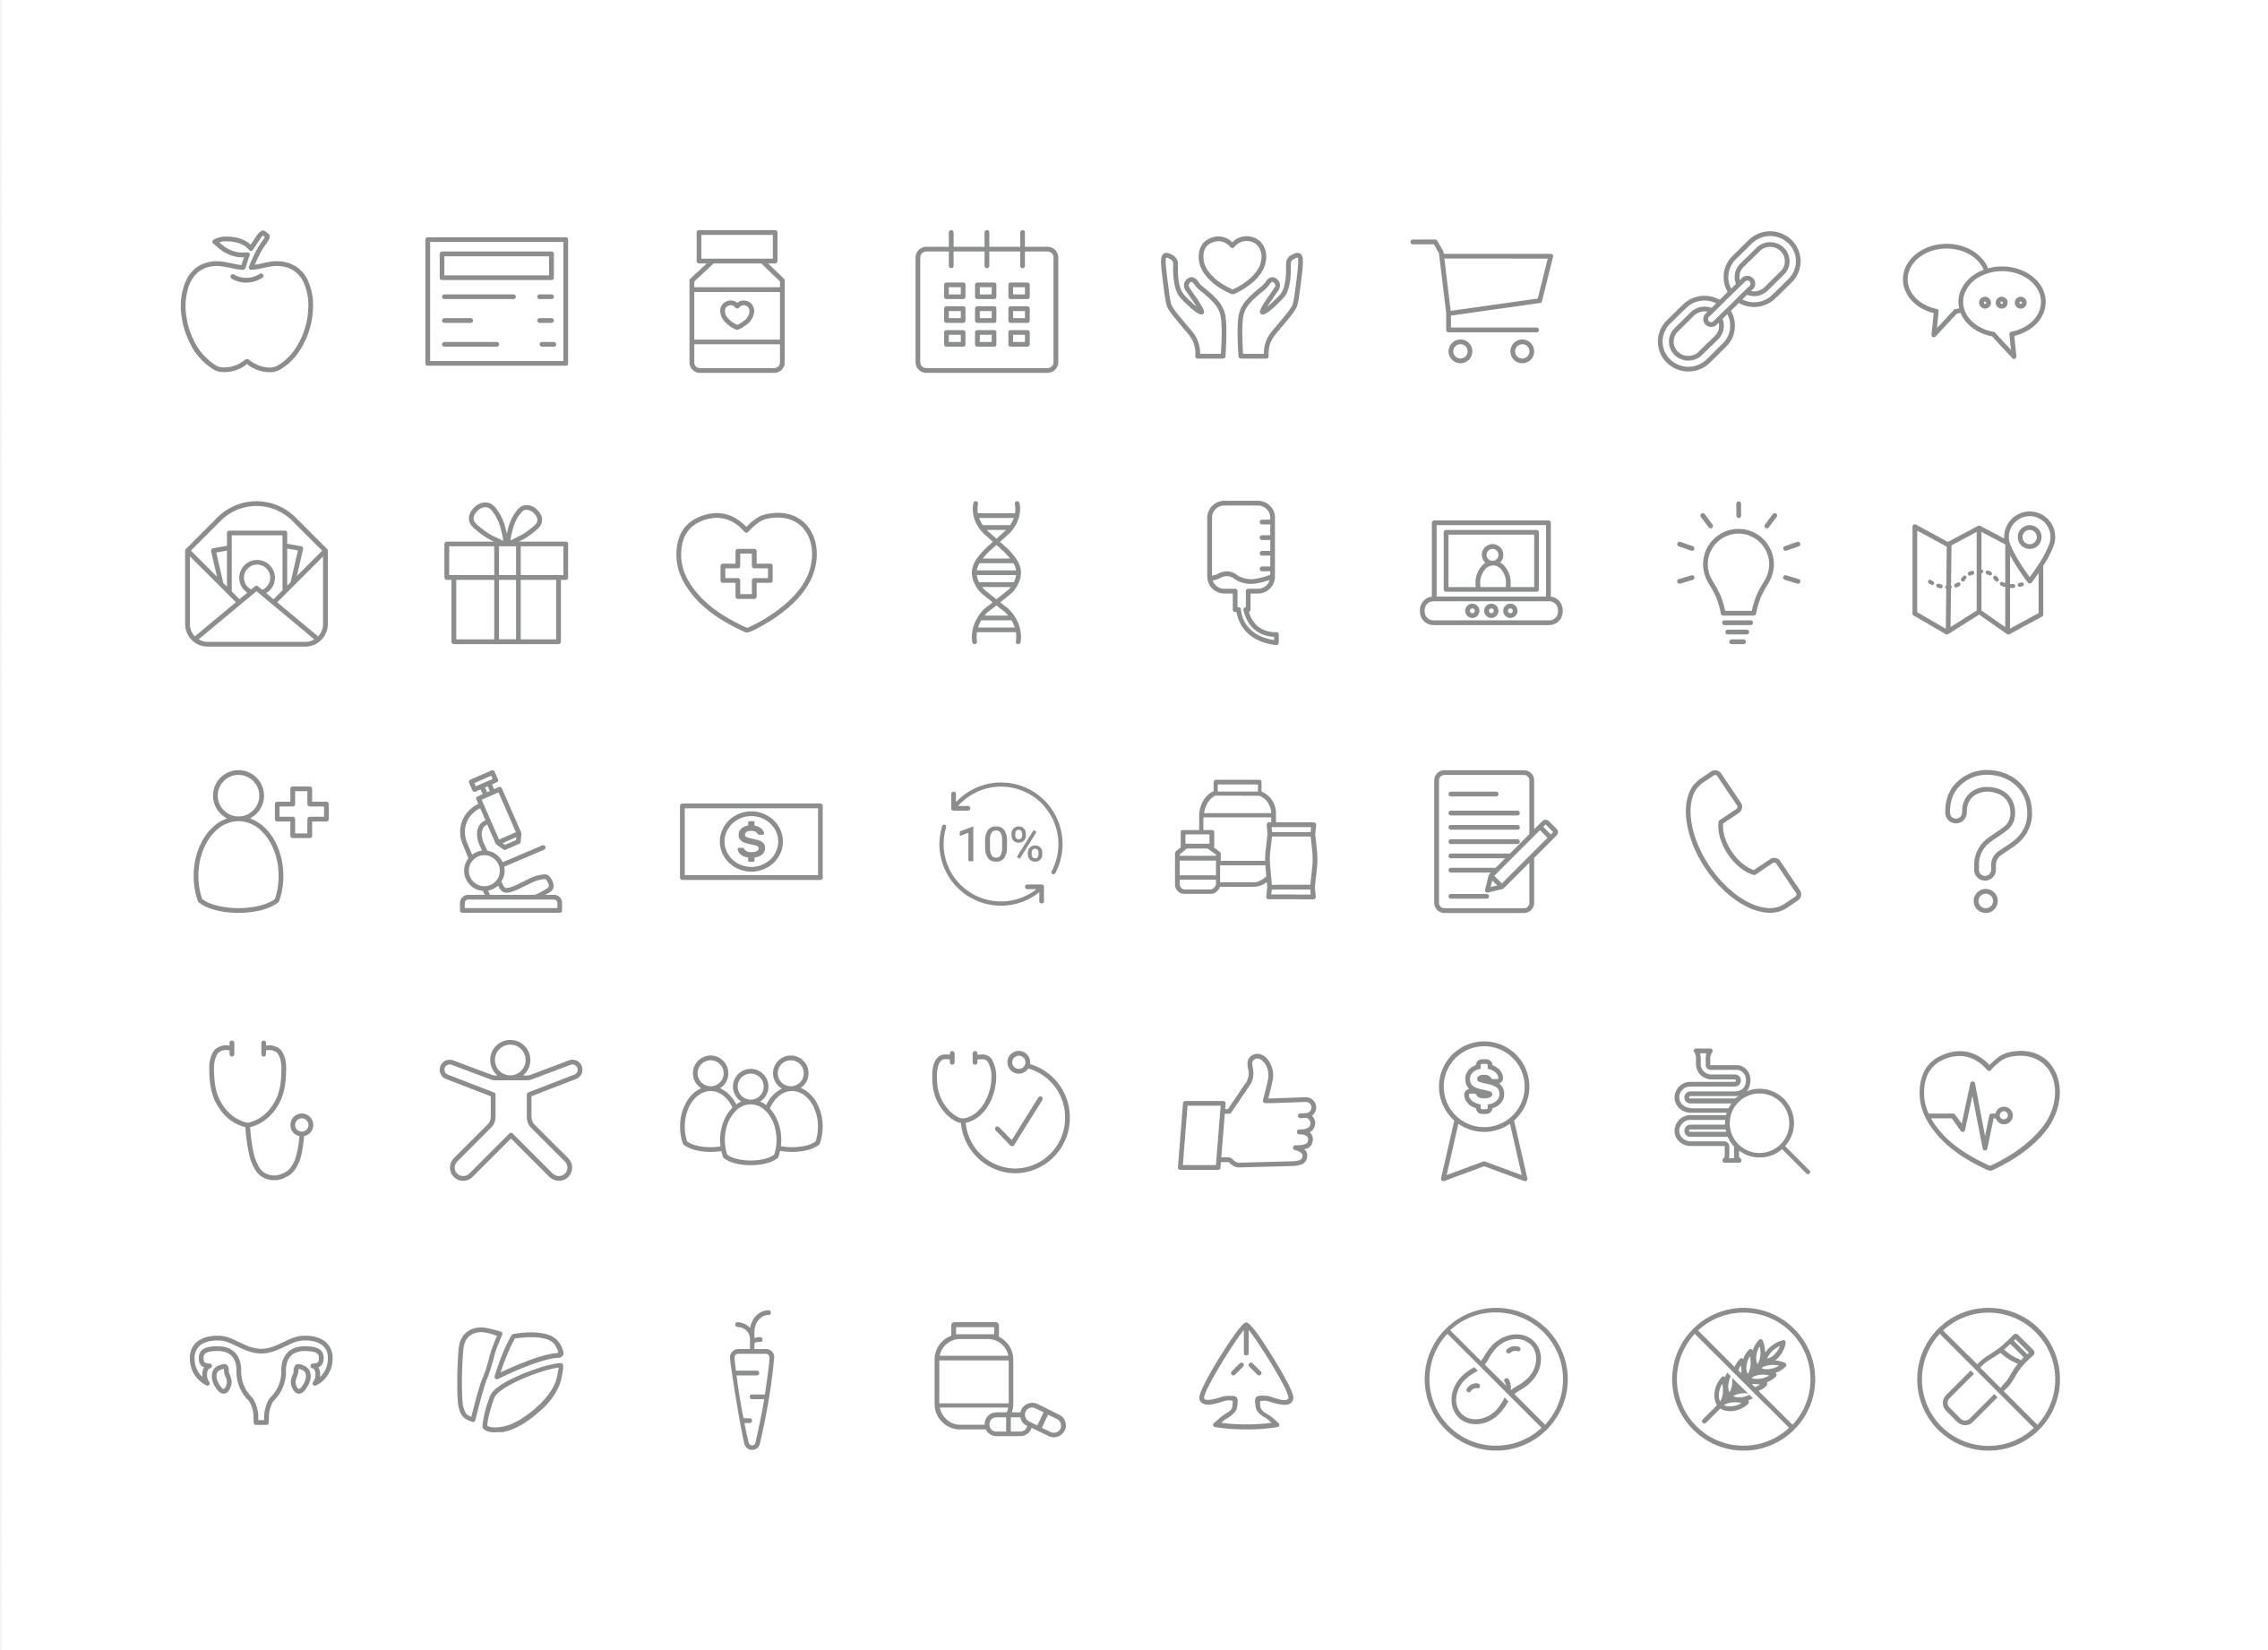 The full icon set for Good Medicine